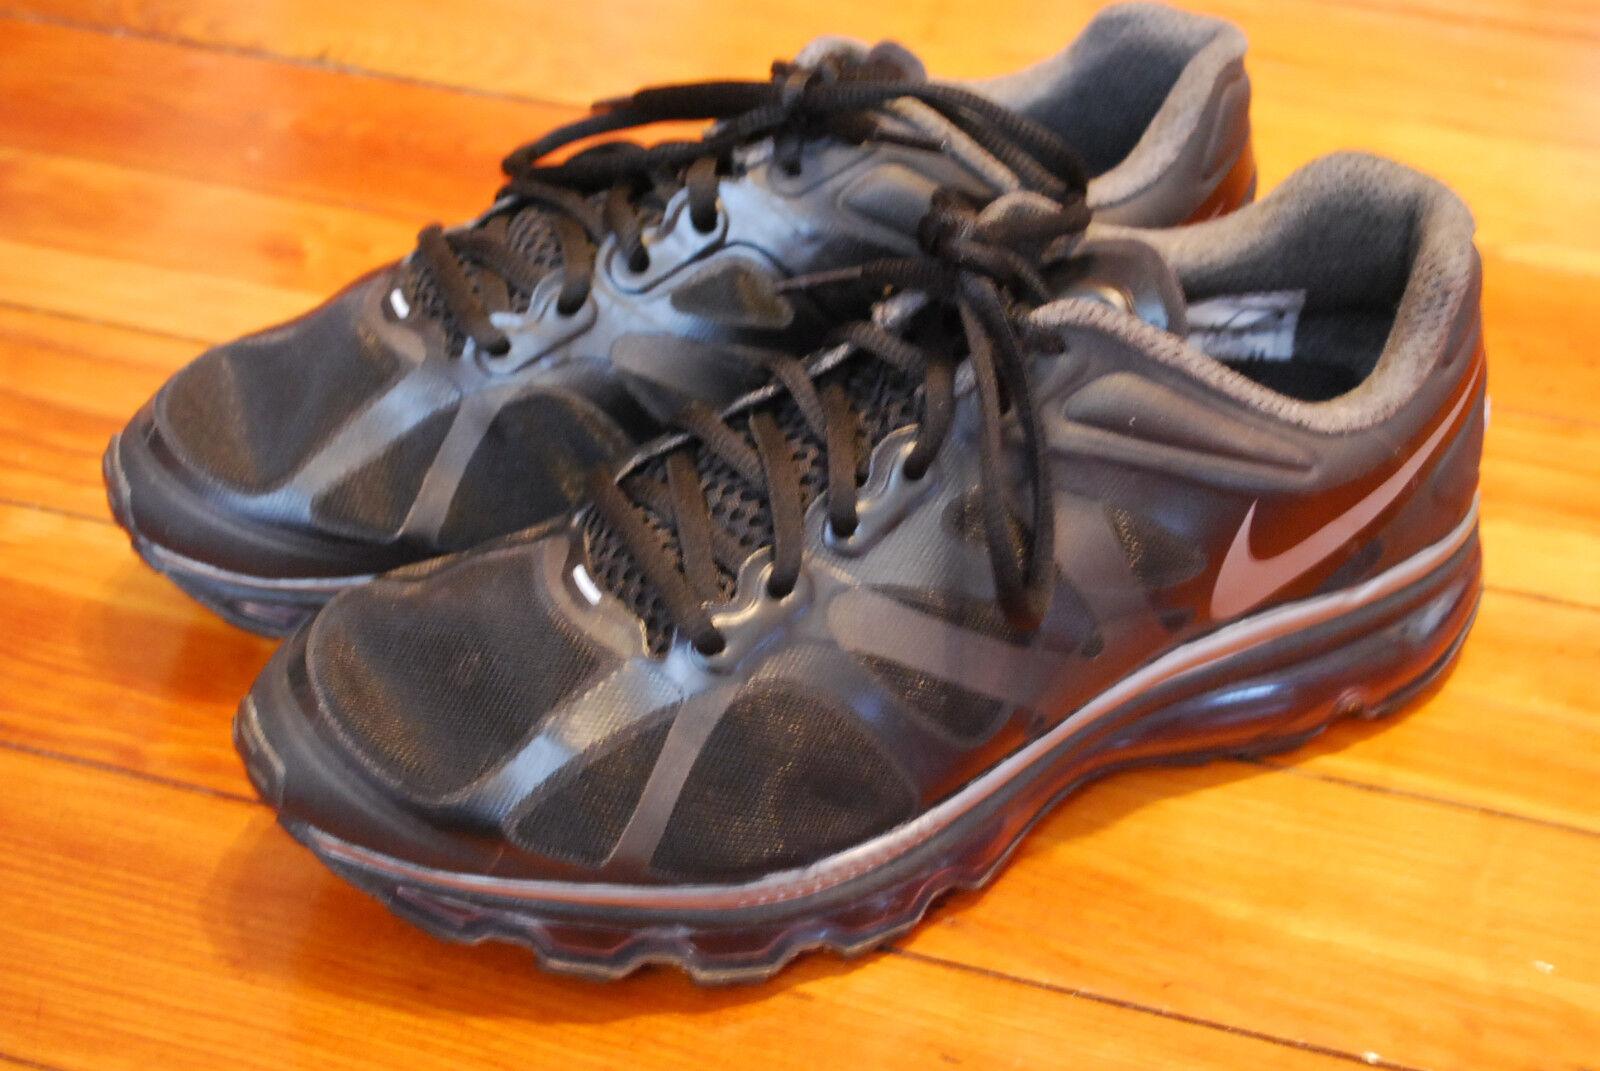 new product 586cd d0c6f ... Women s Nike Air Max 2012 Plus Black   Metallic Cool Cool Cool Gray  Running Sneakers ...